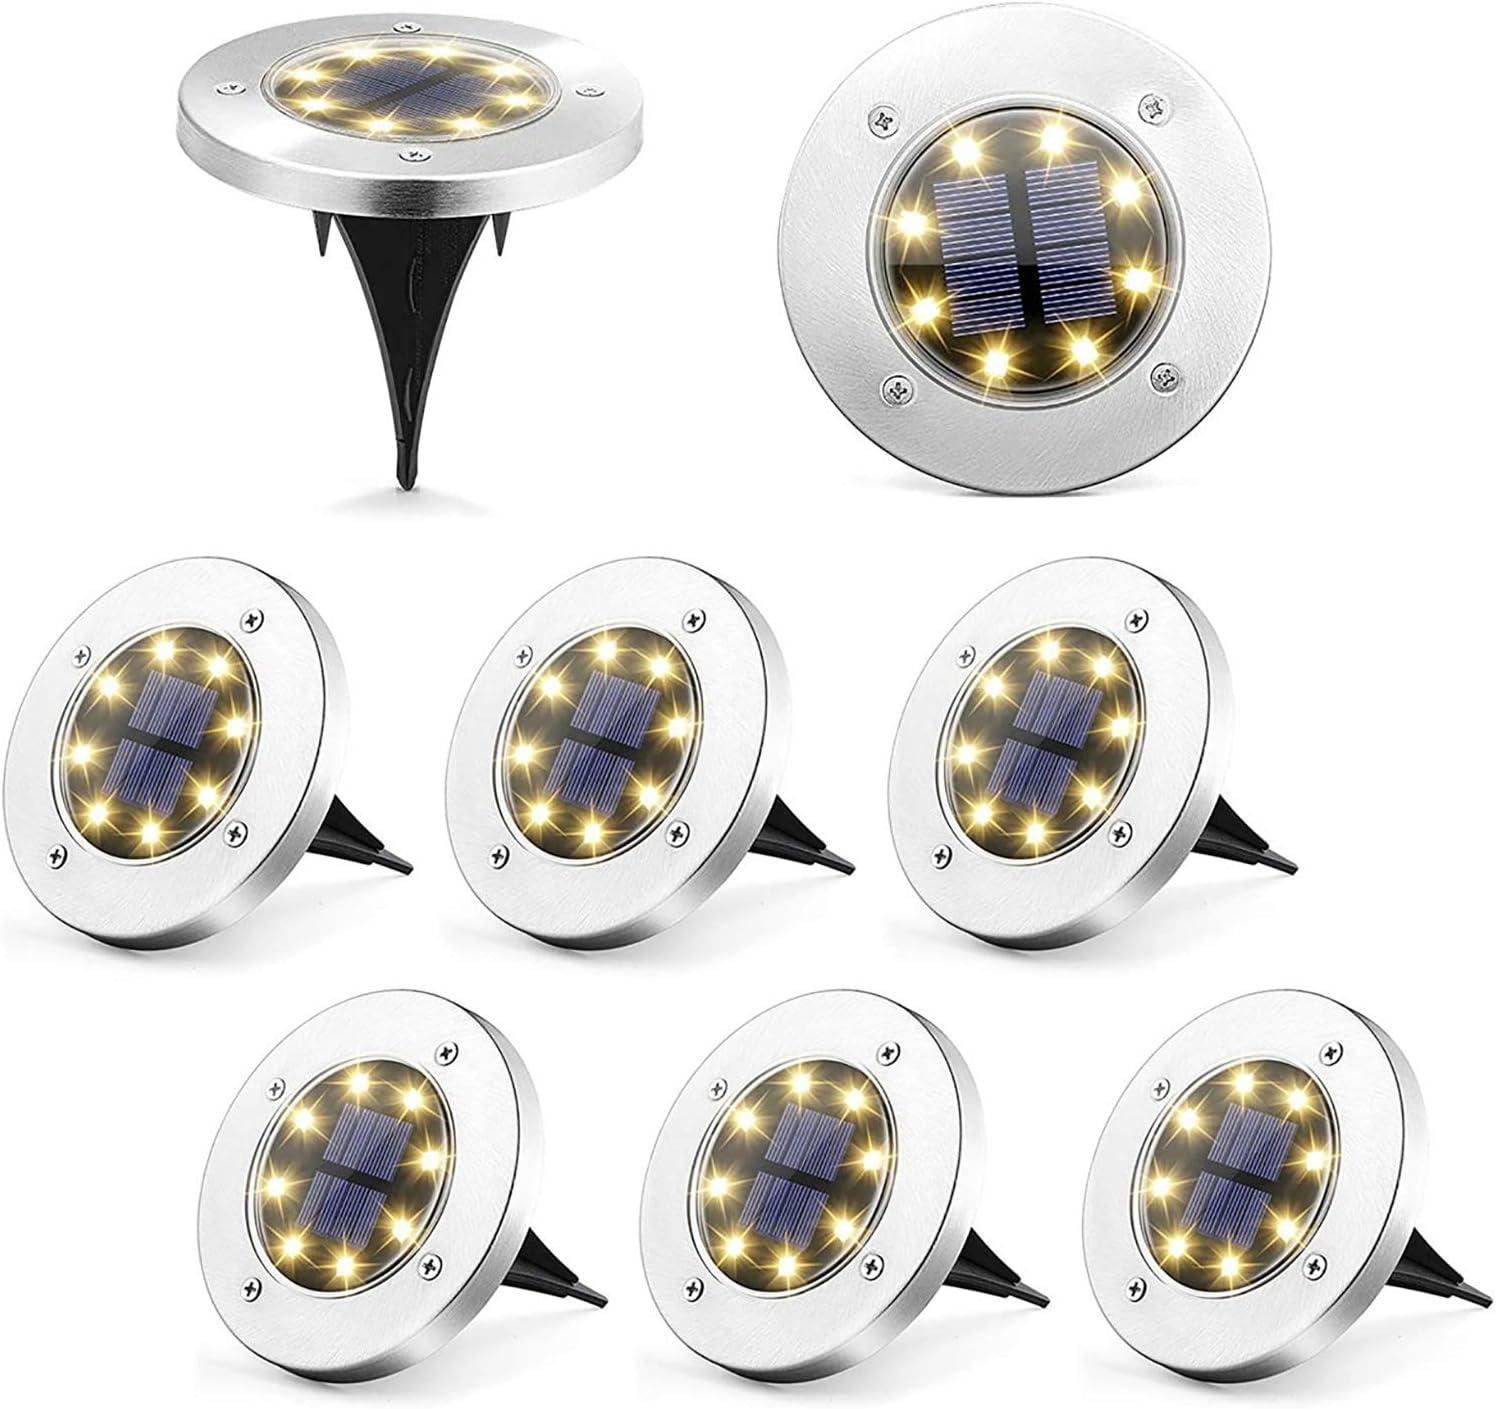 Puncools Solar Ground Light, 8 Packs IP65 Waterproof Outdoor Solar Disk Light, Solar Powered Warm White LEDs Ground Lights for Night Deco &Lighting of Gardens, Yards, Pathways, Walkways